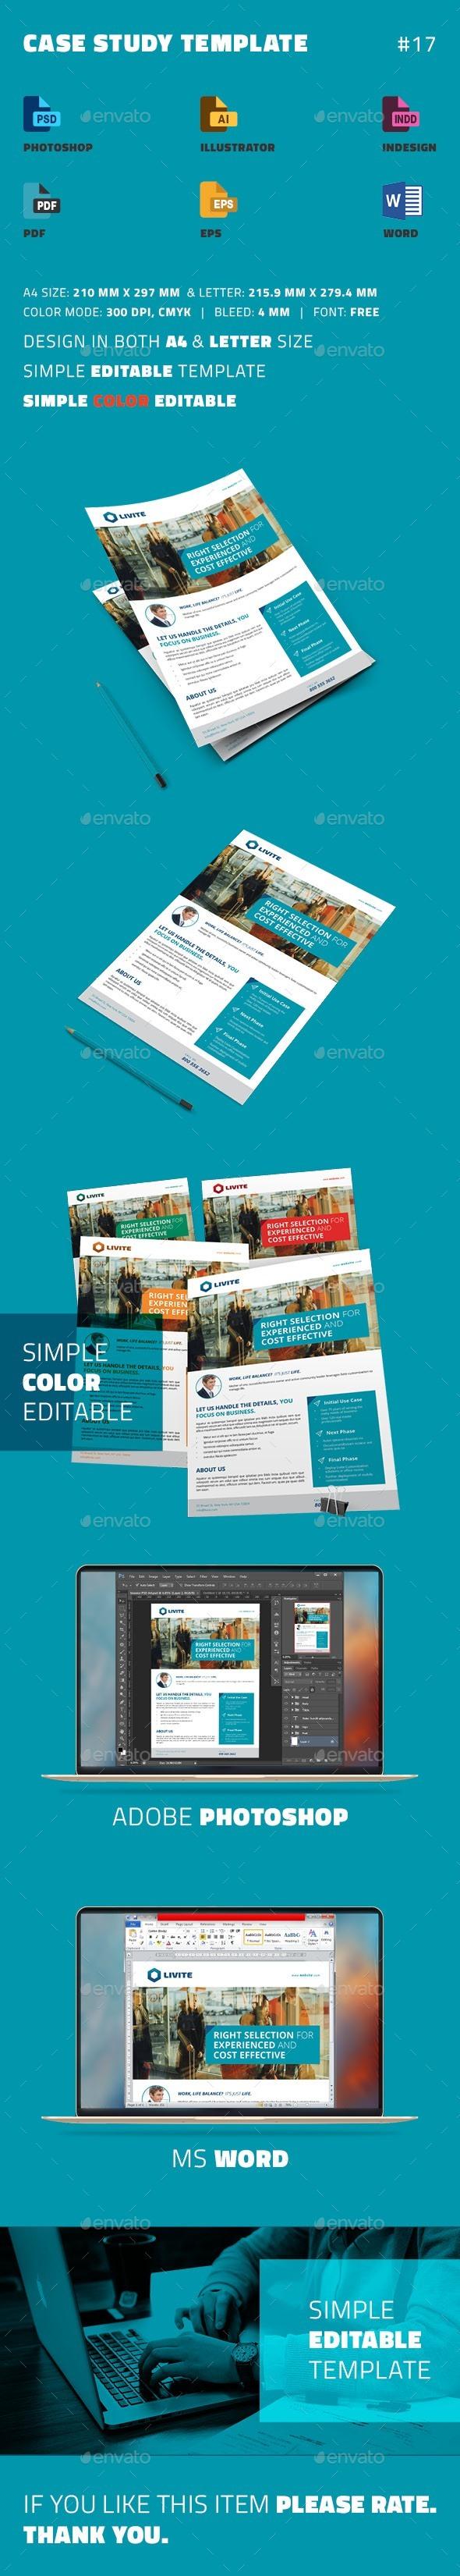 Case study template graphics designs templates maxwellsz